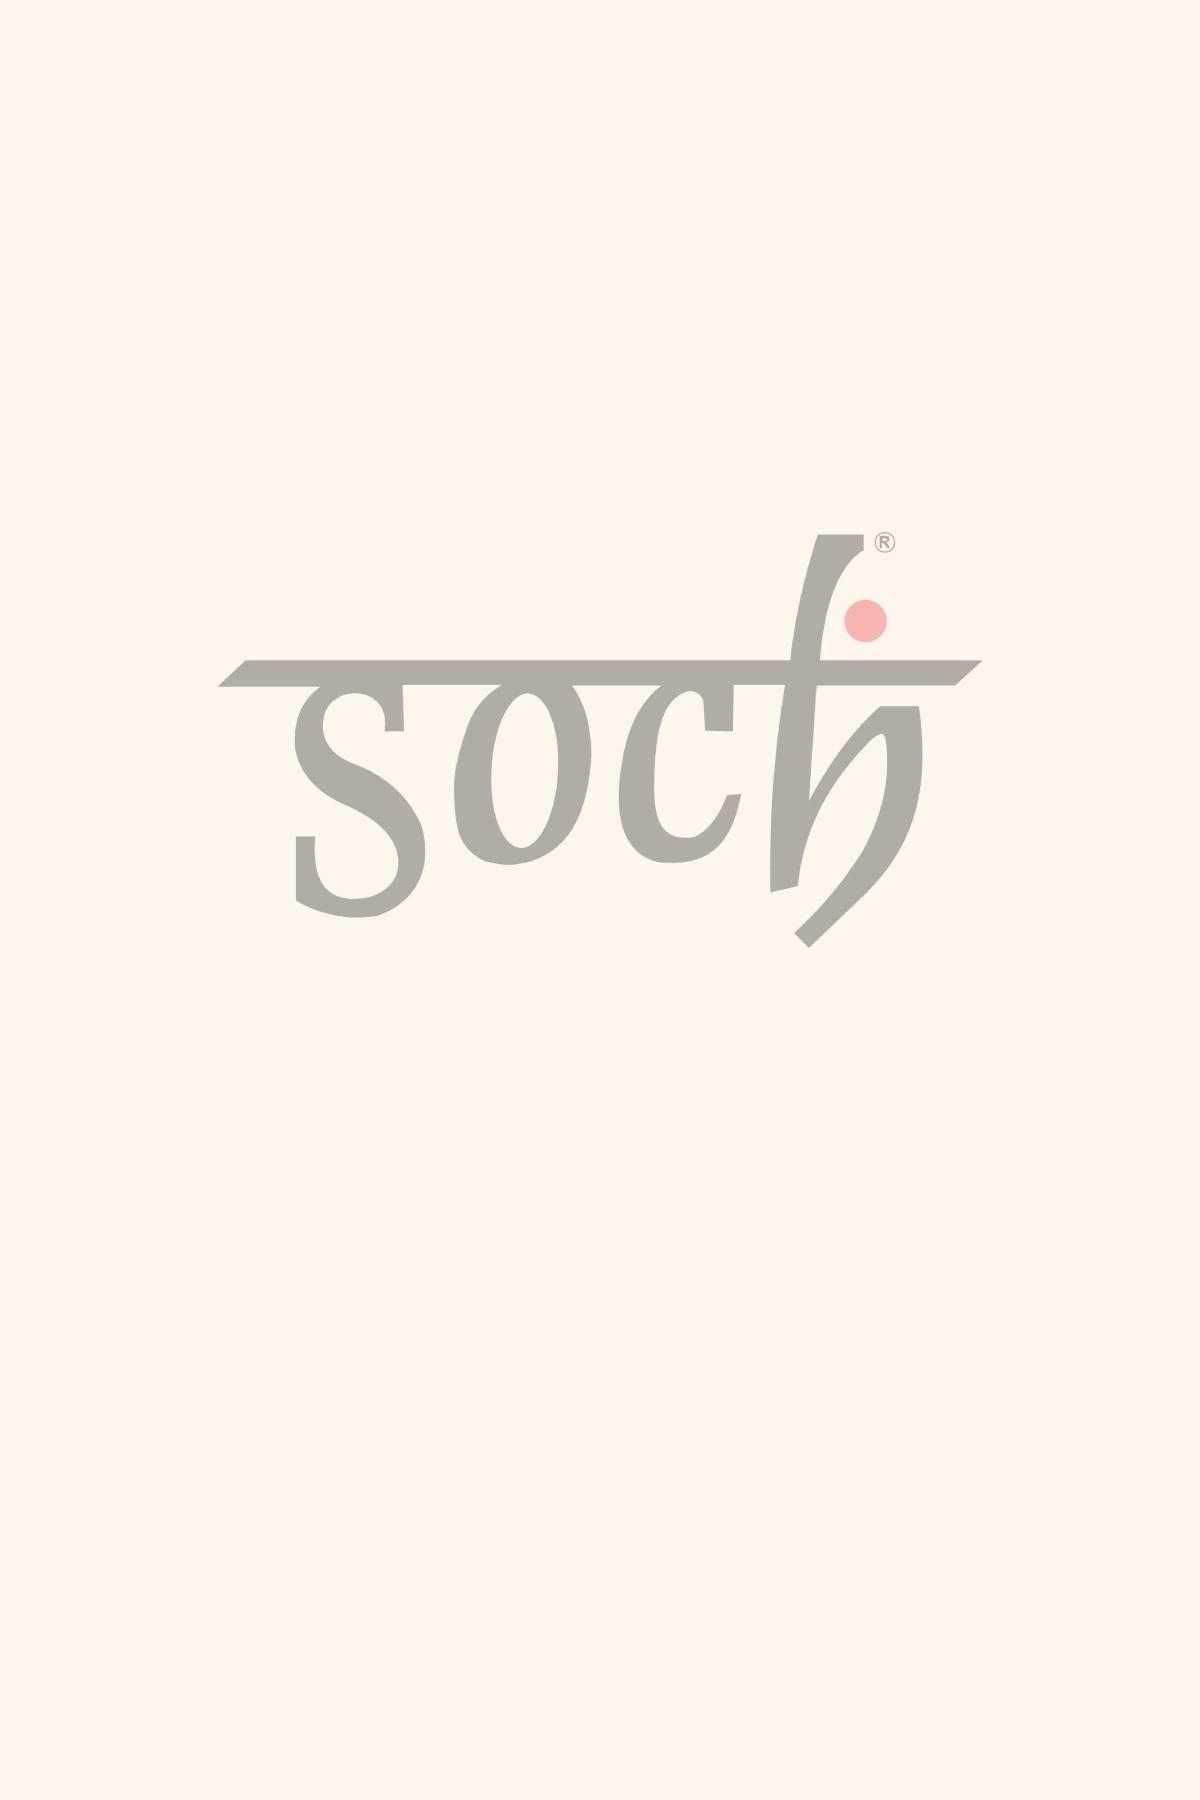 cb0f237e7a ... Soch Beige Chanderi Embroidered Dress Materails - SAMR RTS 28004. 30%  off